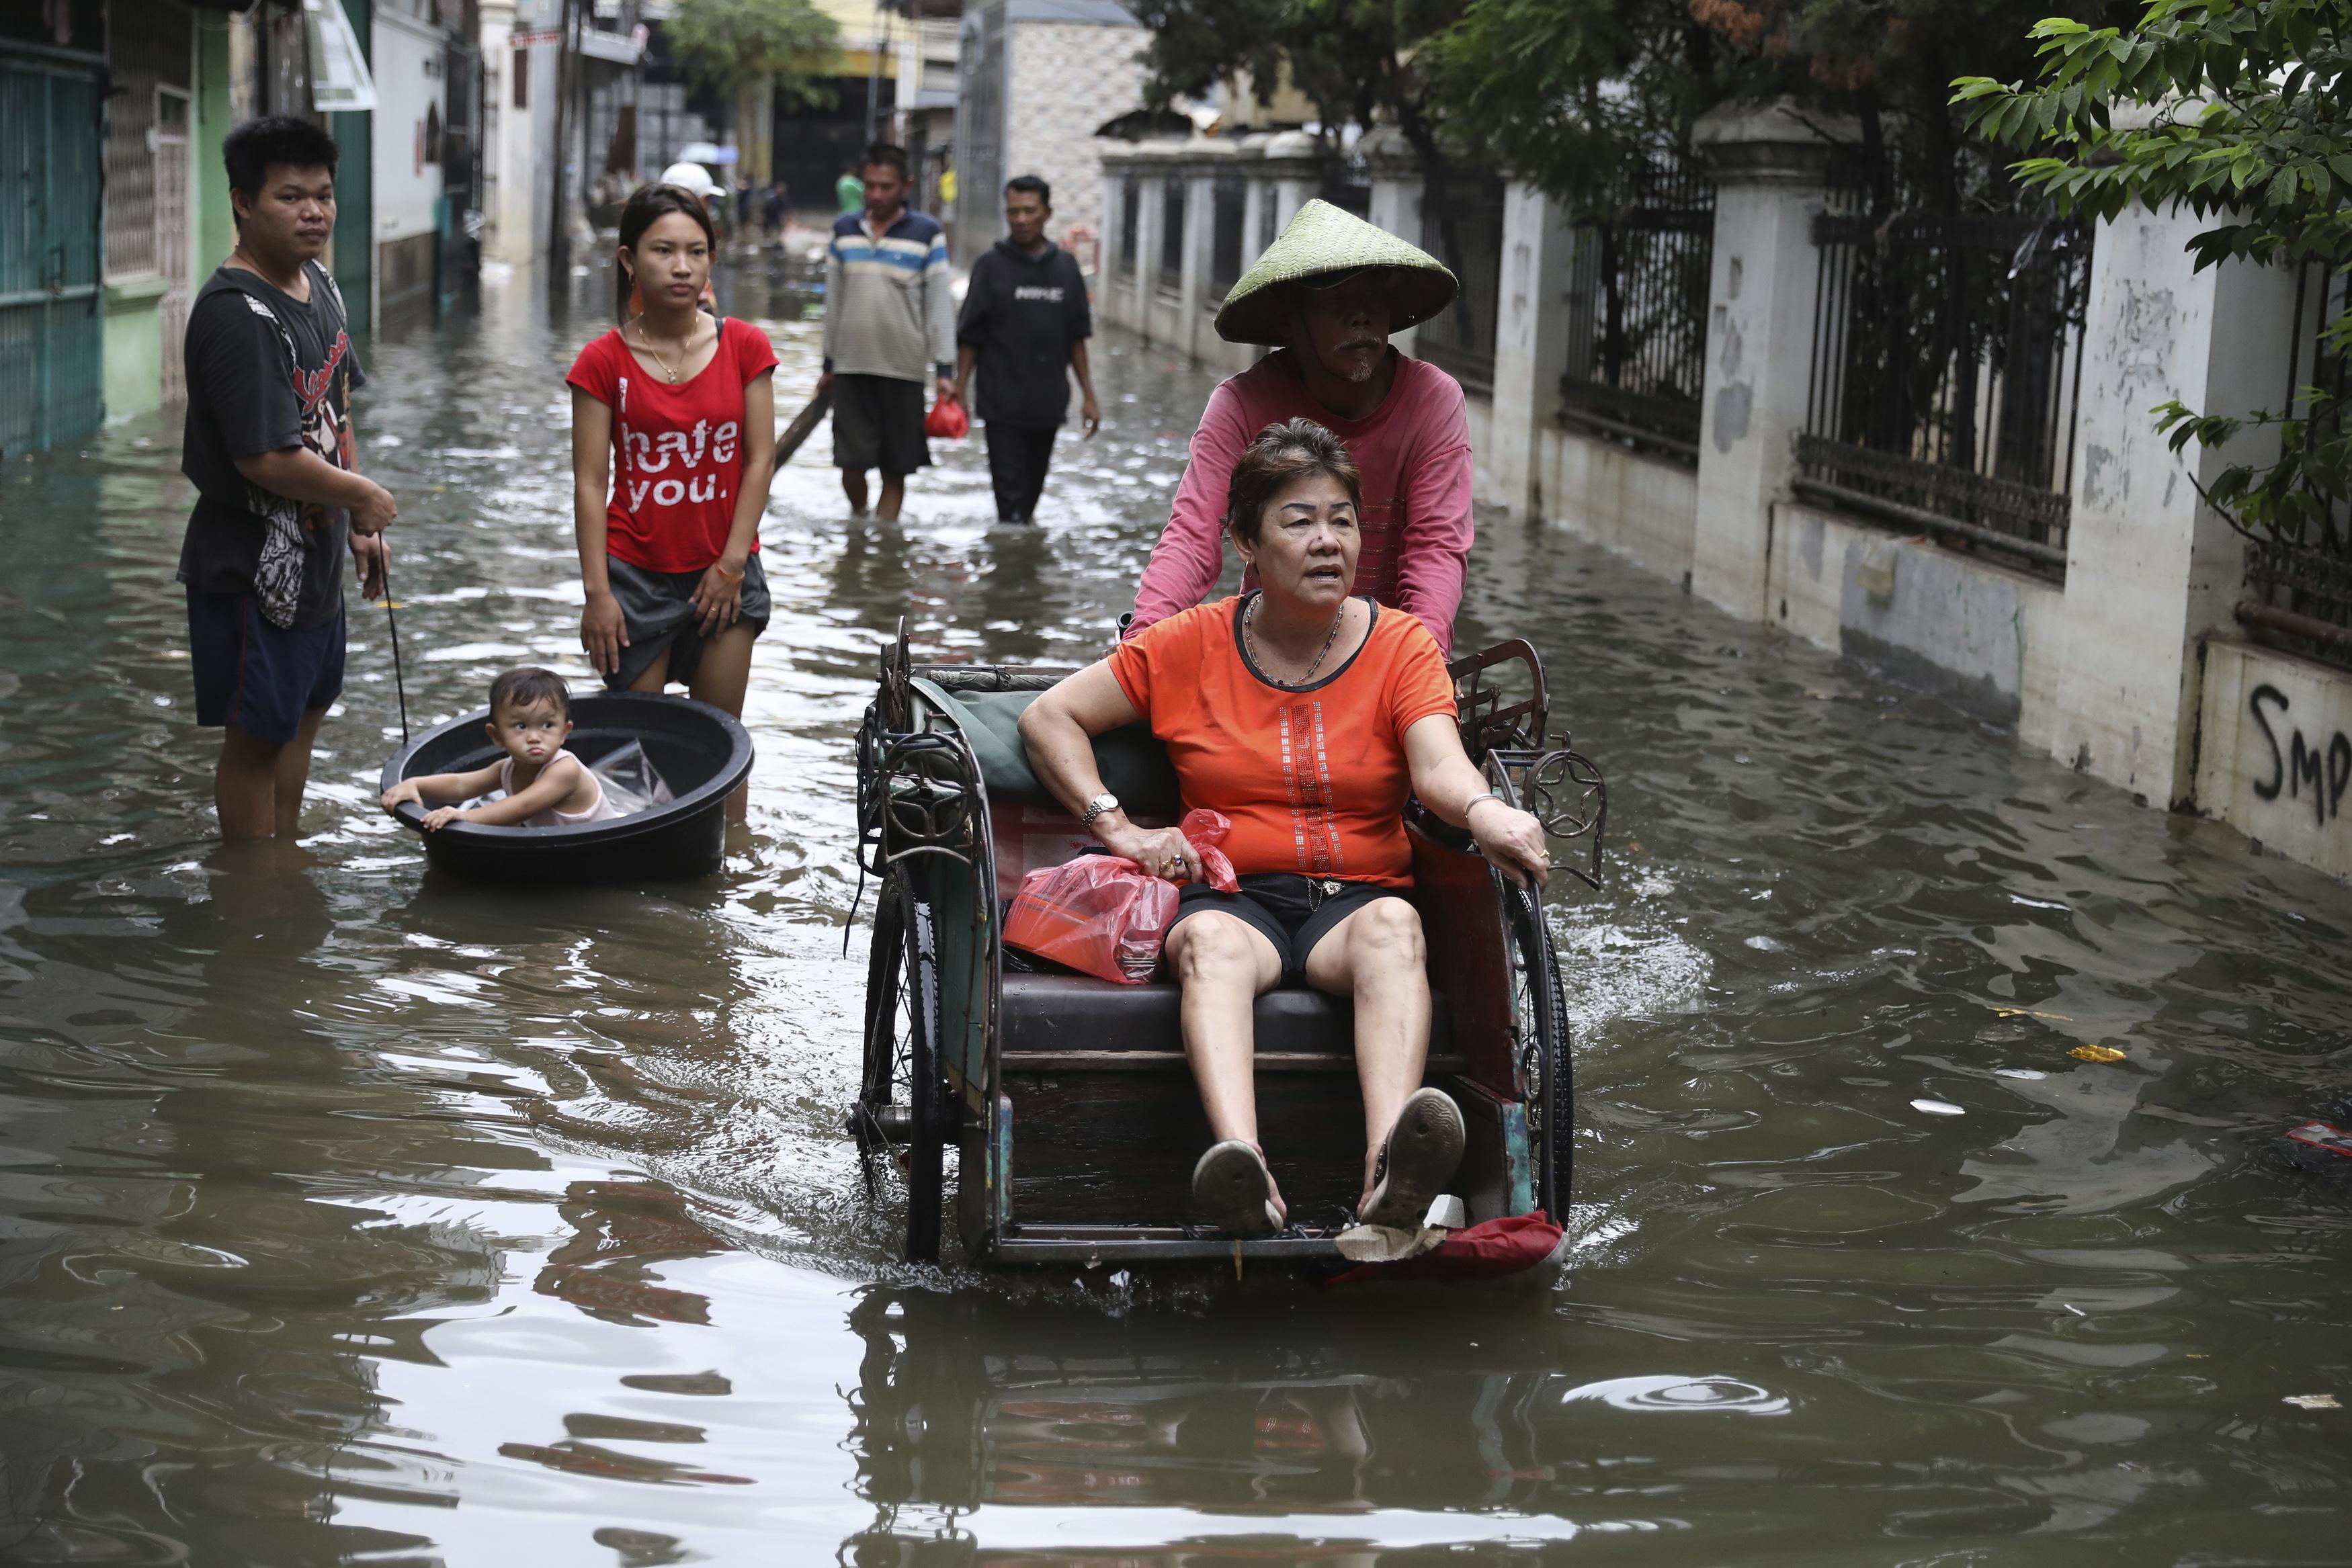 53 dead in landslides, flash floods in Indonesias capital